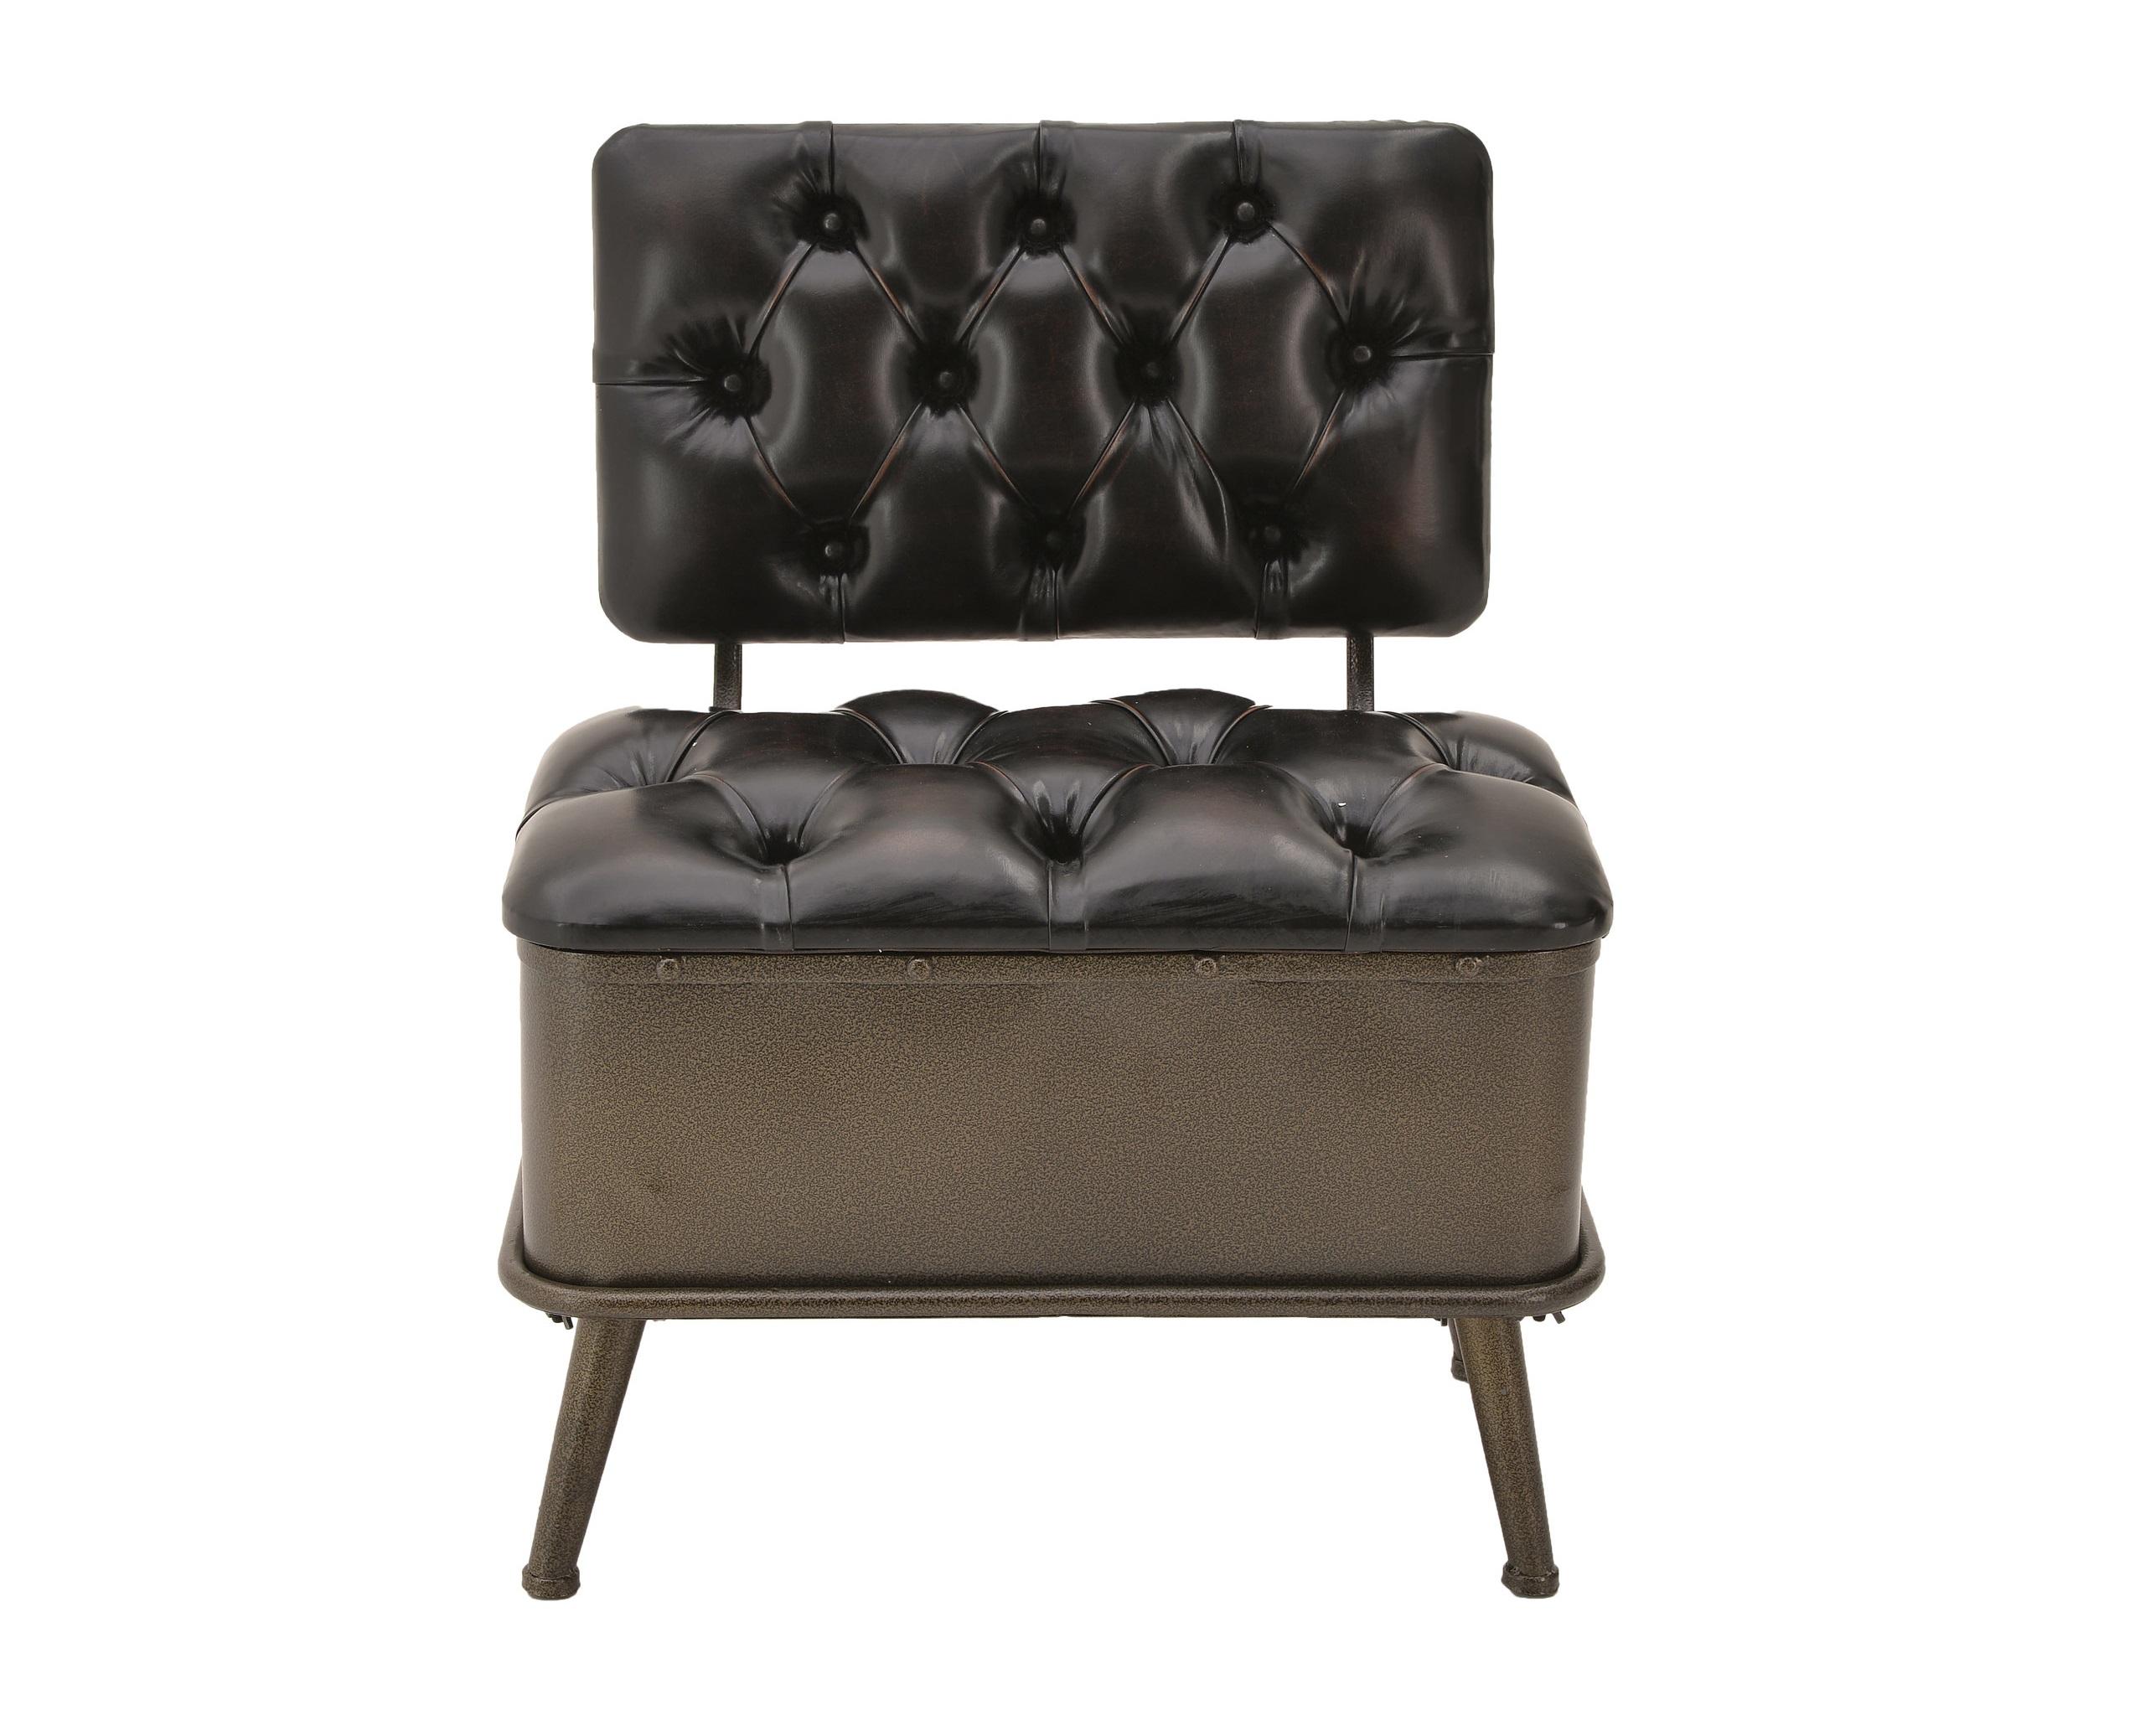 Кресло-сундук BrodoКожаные кресла<br><br><br>Material: Кожа<br>Ширина см: 60<br>Высота см: 75<br>Глубина см: 45